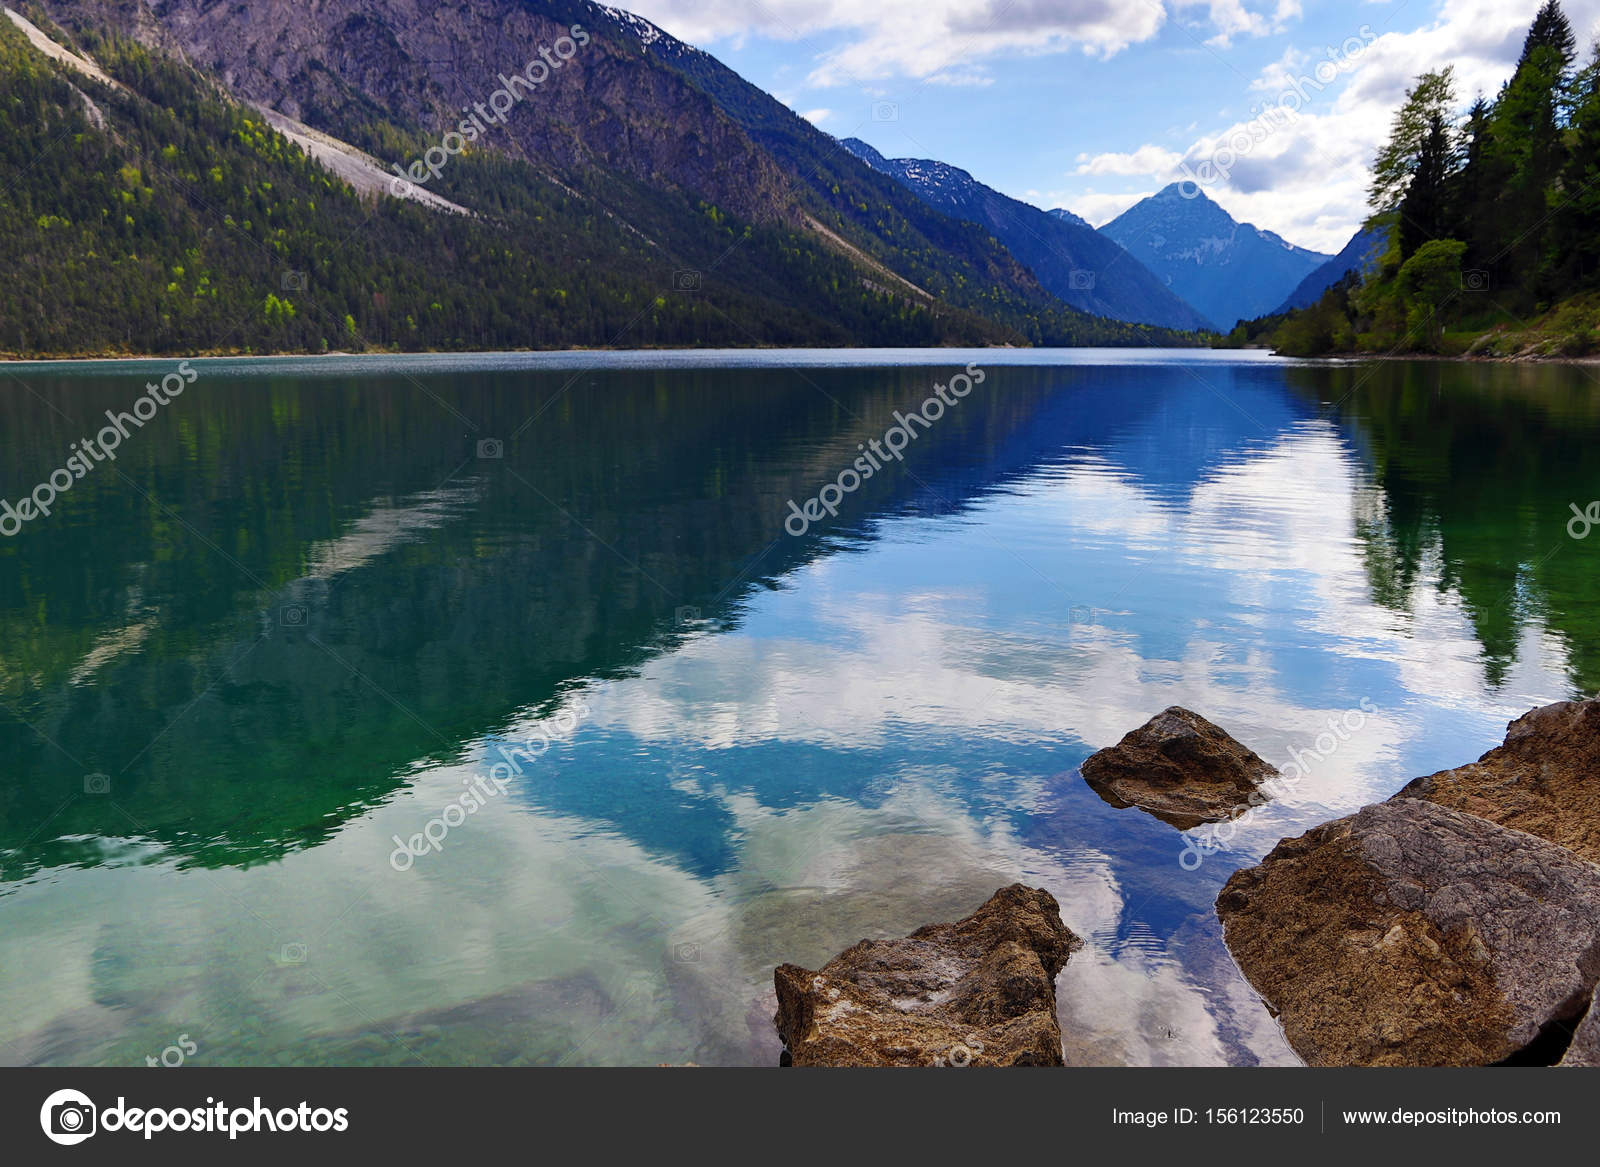 Обои австрия, alps, тироль, austria, tirol, Lake plansee, озеро планзее. Пейзажи foto 16